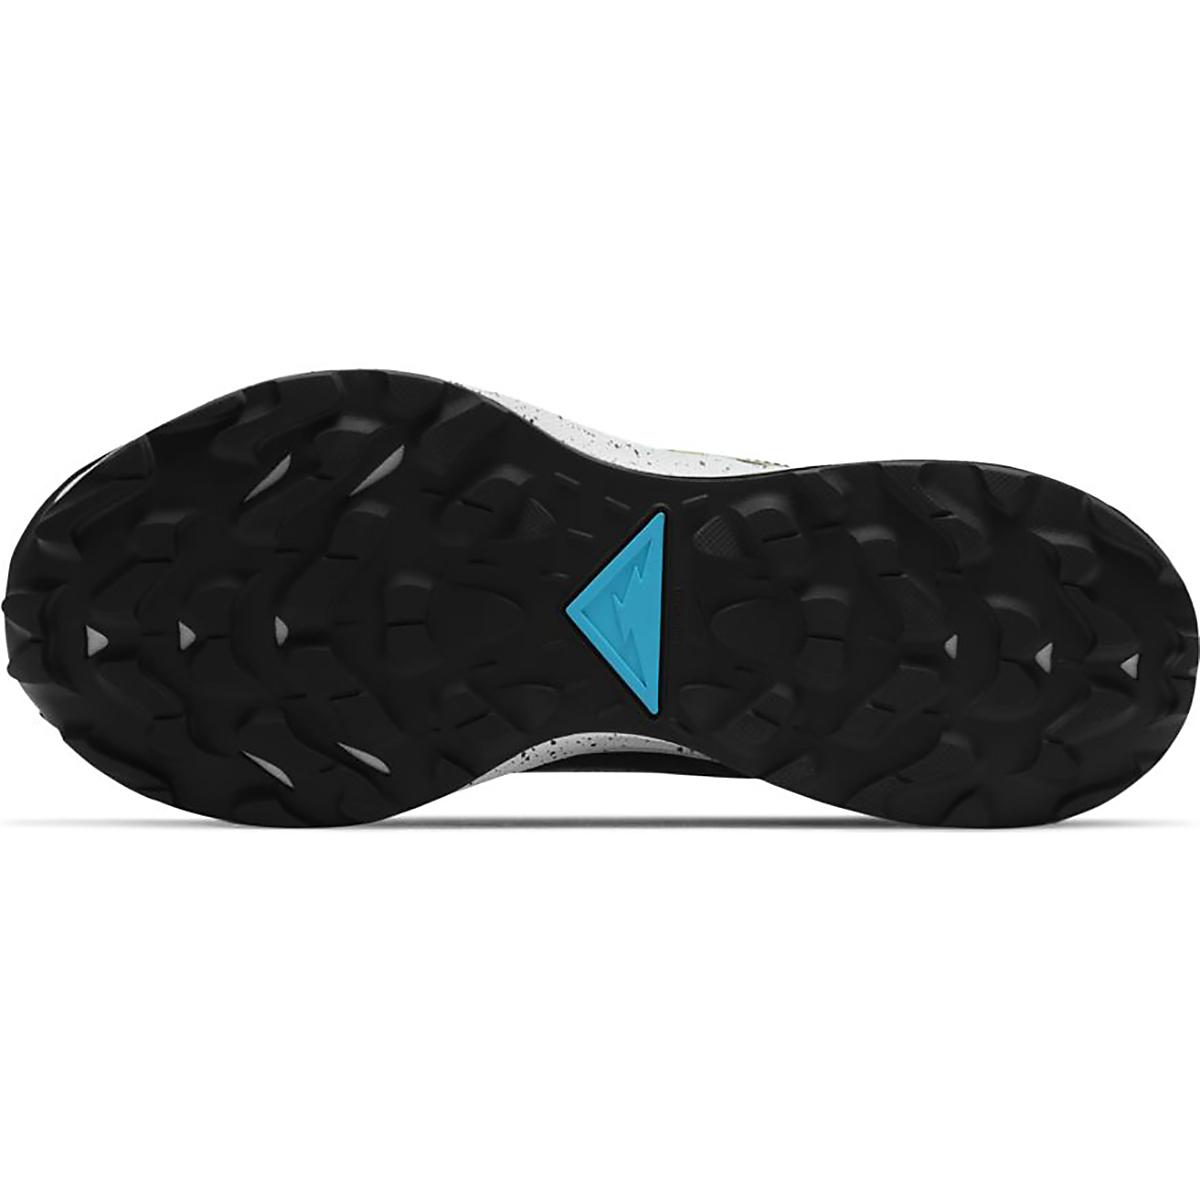 Men's Nike Pegasus Trail 2 Trail Running Shoe - Color: Black/Dark Sulfur-Off Noir-Chile Red - Size: 6 - Width: Regular, Black/Dark Sulfur-Off Noir-Chile Red, large, image 4